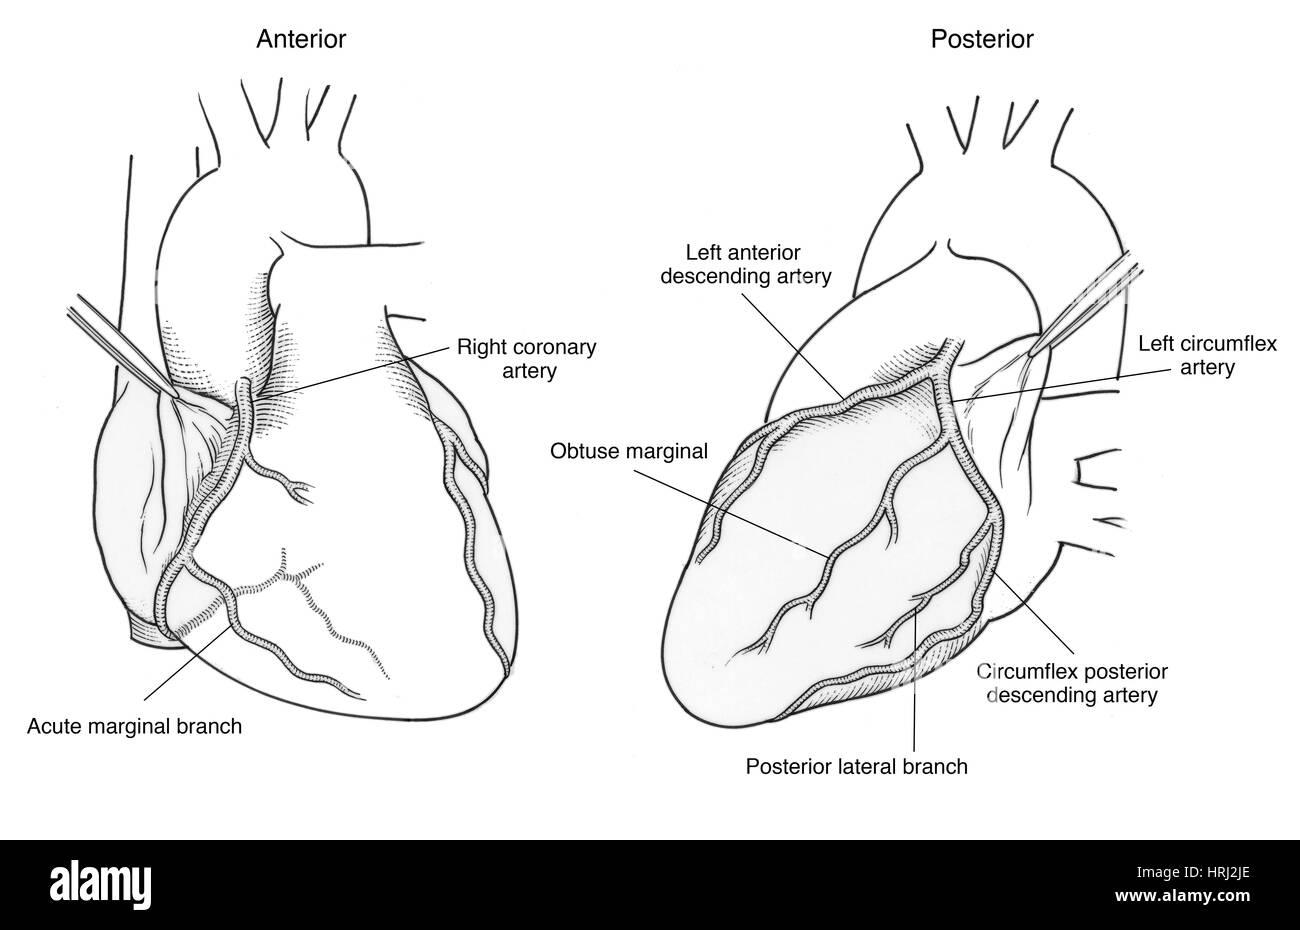 Illustration of Coronary Arteries Stock Photo: 135006886 - Alamy